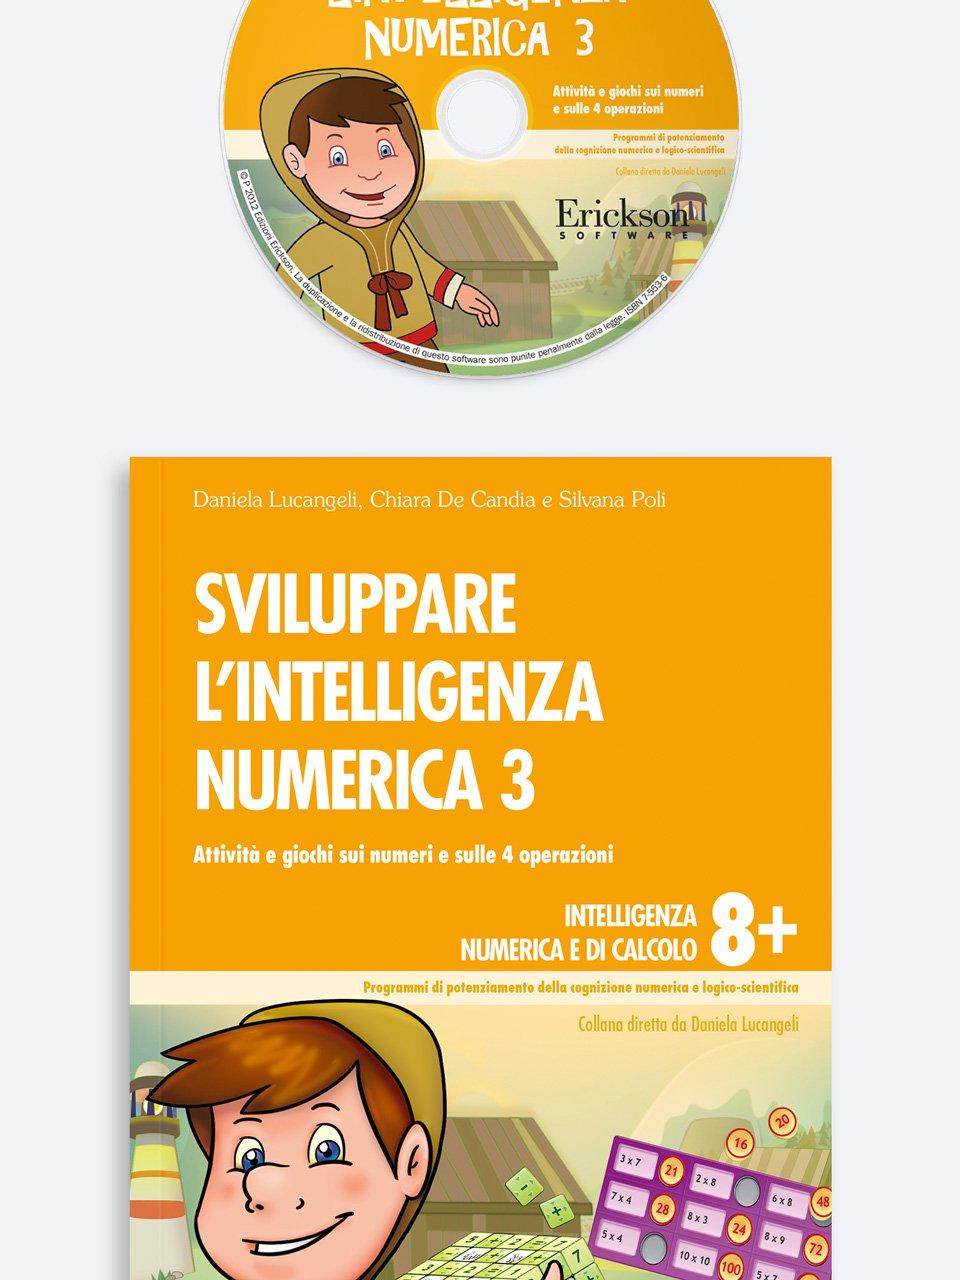 Sviluppare l'intelligenza numerica 3 - Daniela Lucangeli - Erickson